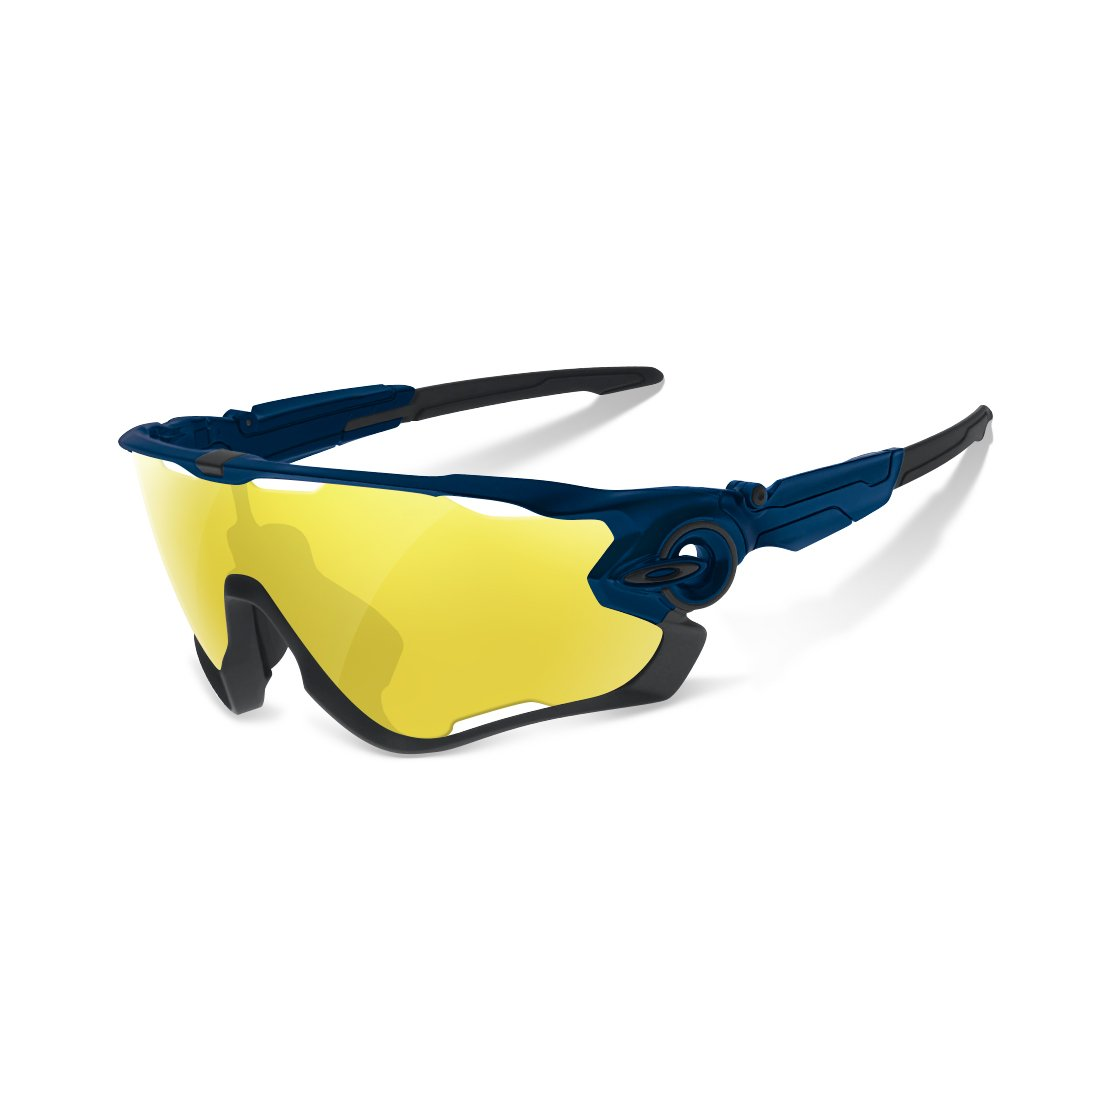 sunglasses restorer Lentes de Recambio Compatibles para Oakley Jawbreaker